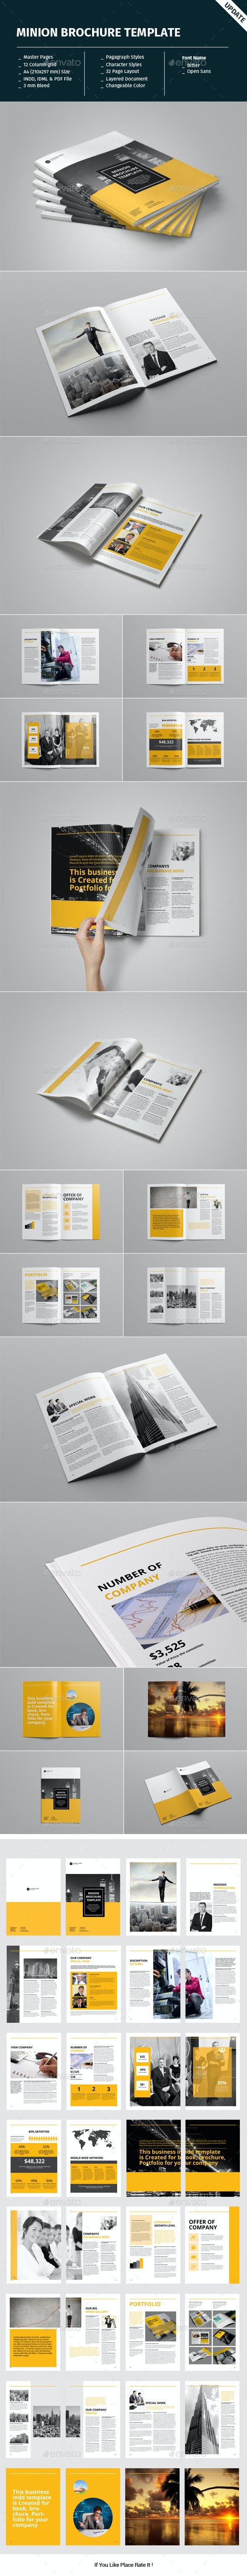 Minion Brochure Templates - Corporate Brochures